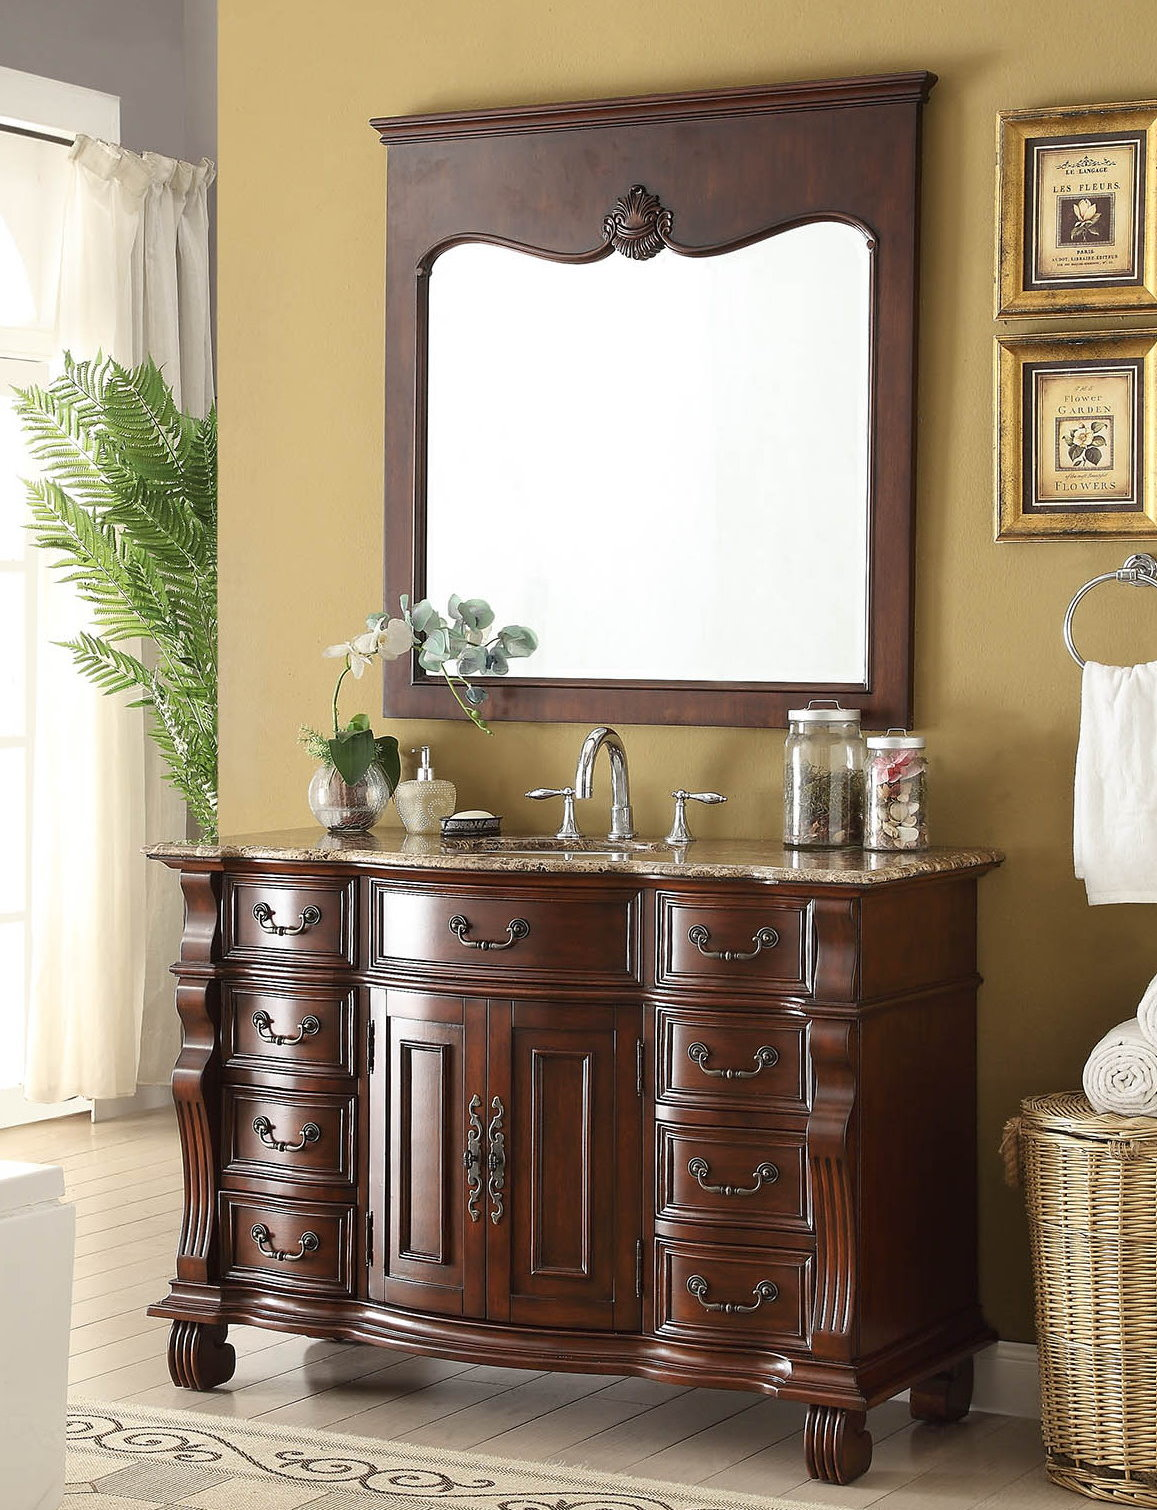 Antique bathroom vanity with mirror - Adelina 50 Inch Antique Bathroom Vanity Brown Finish Brown Marble Top